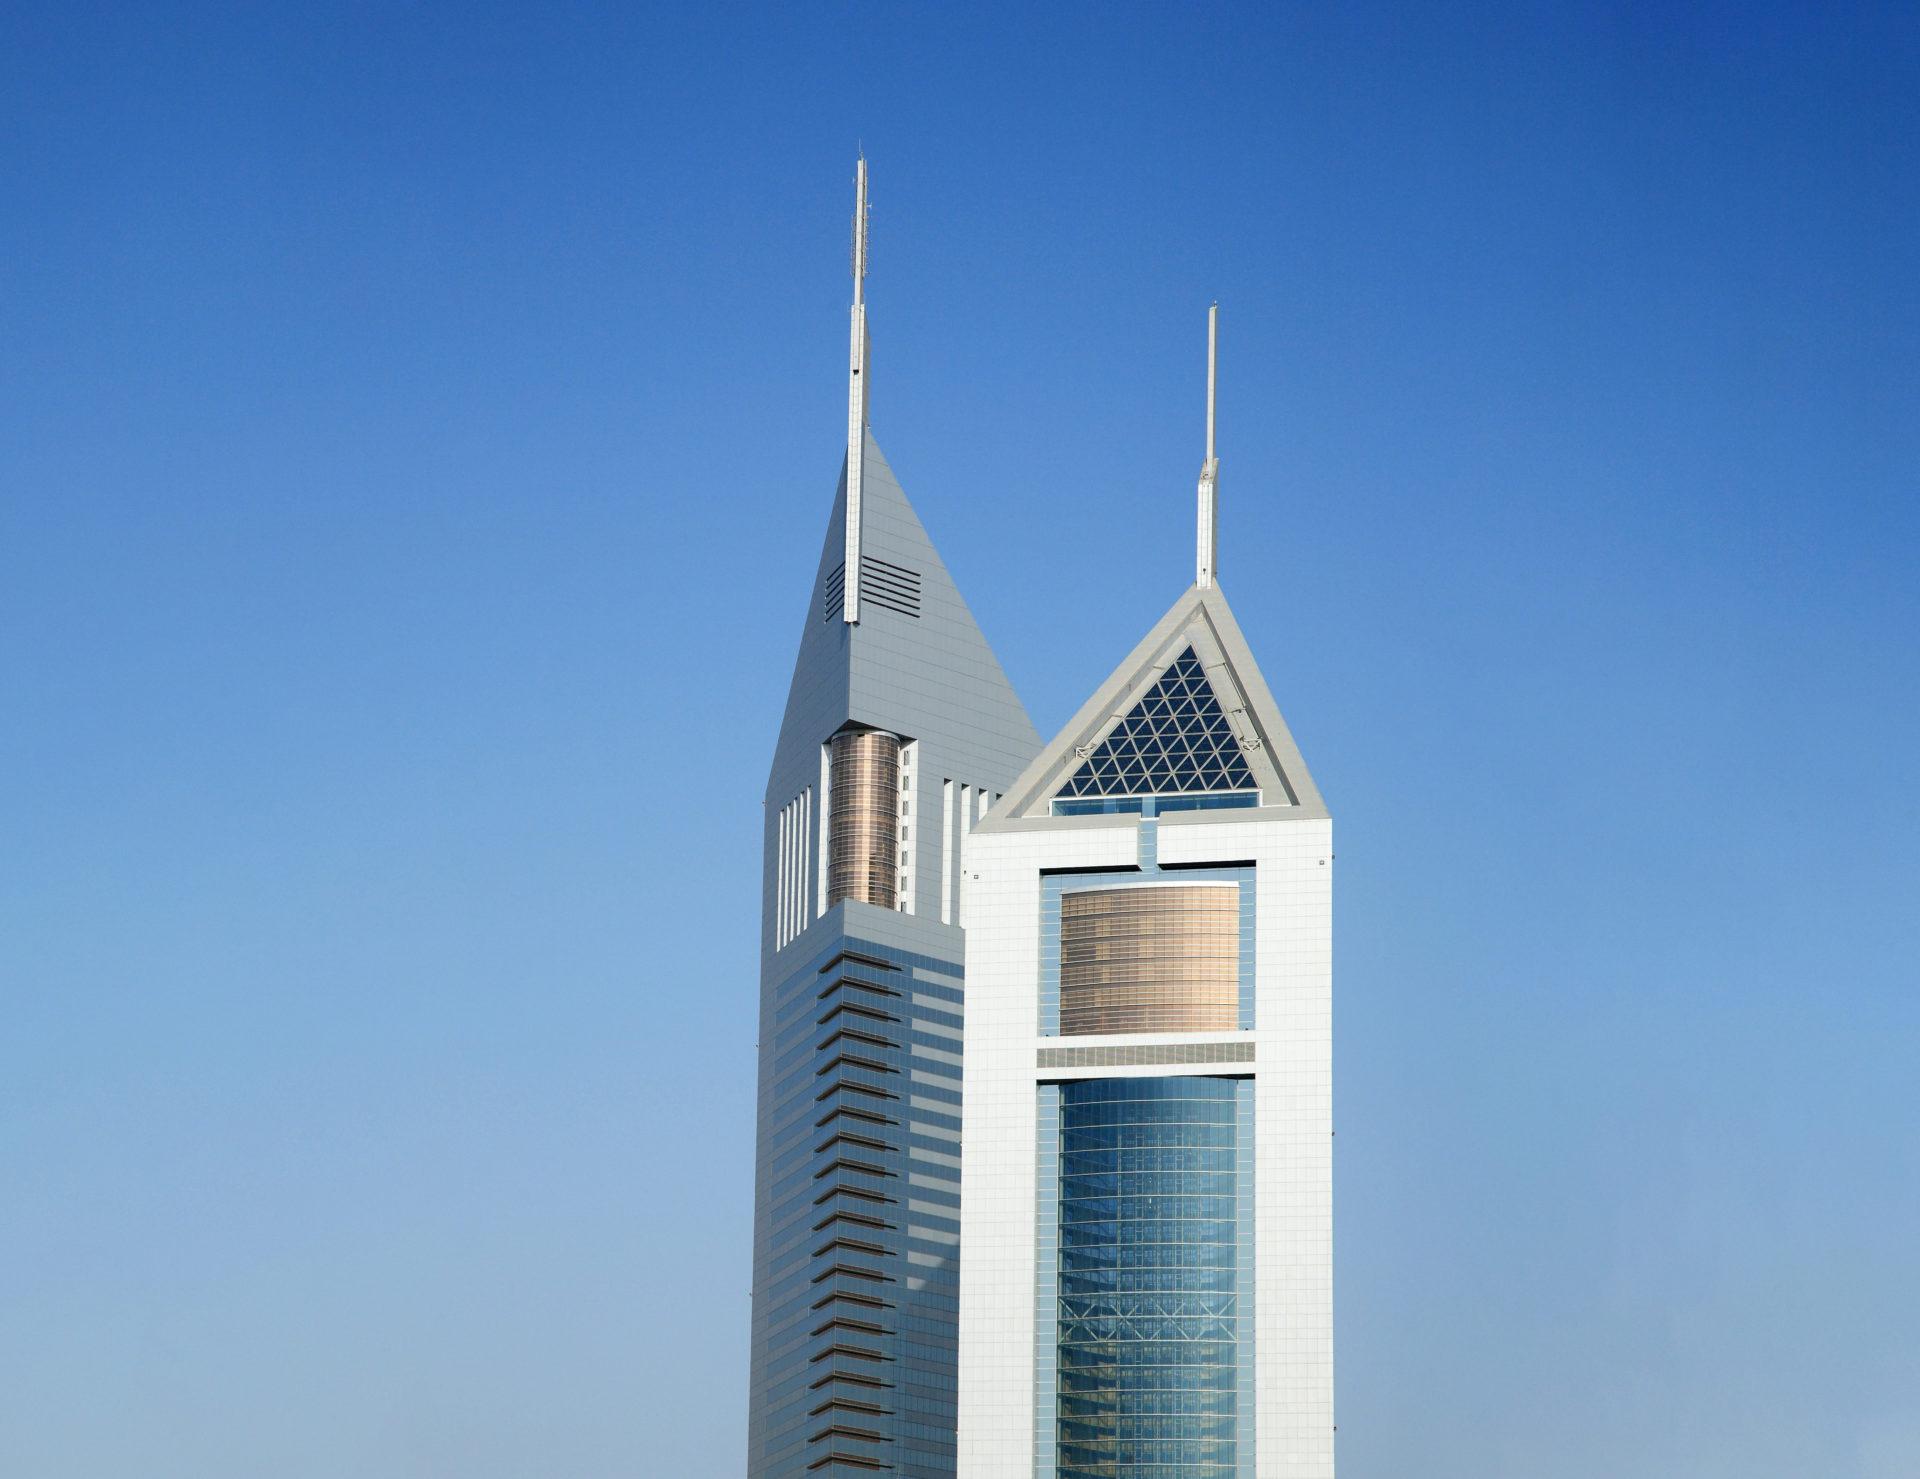 dubai-emirate-towers